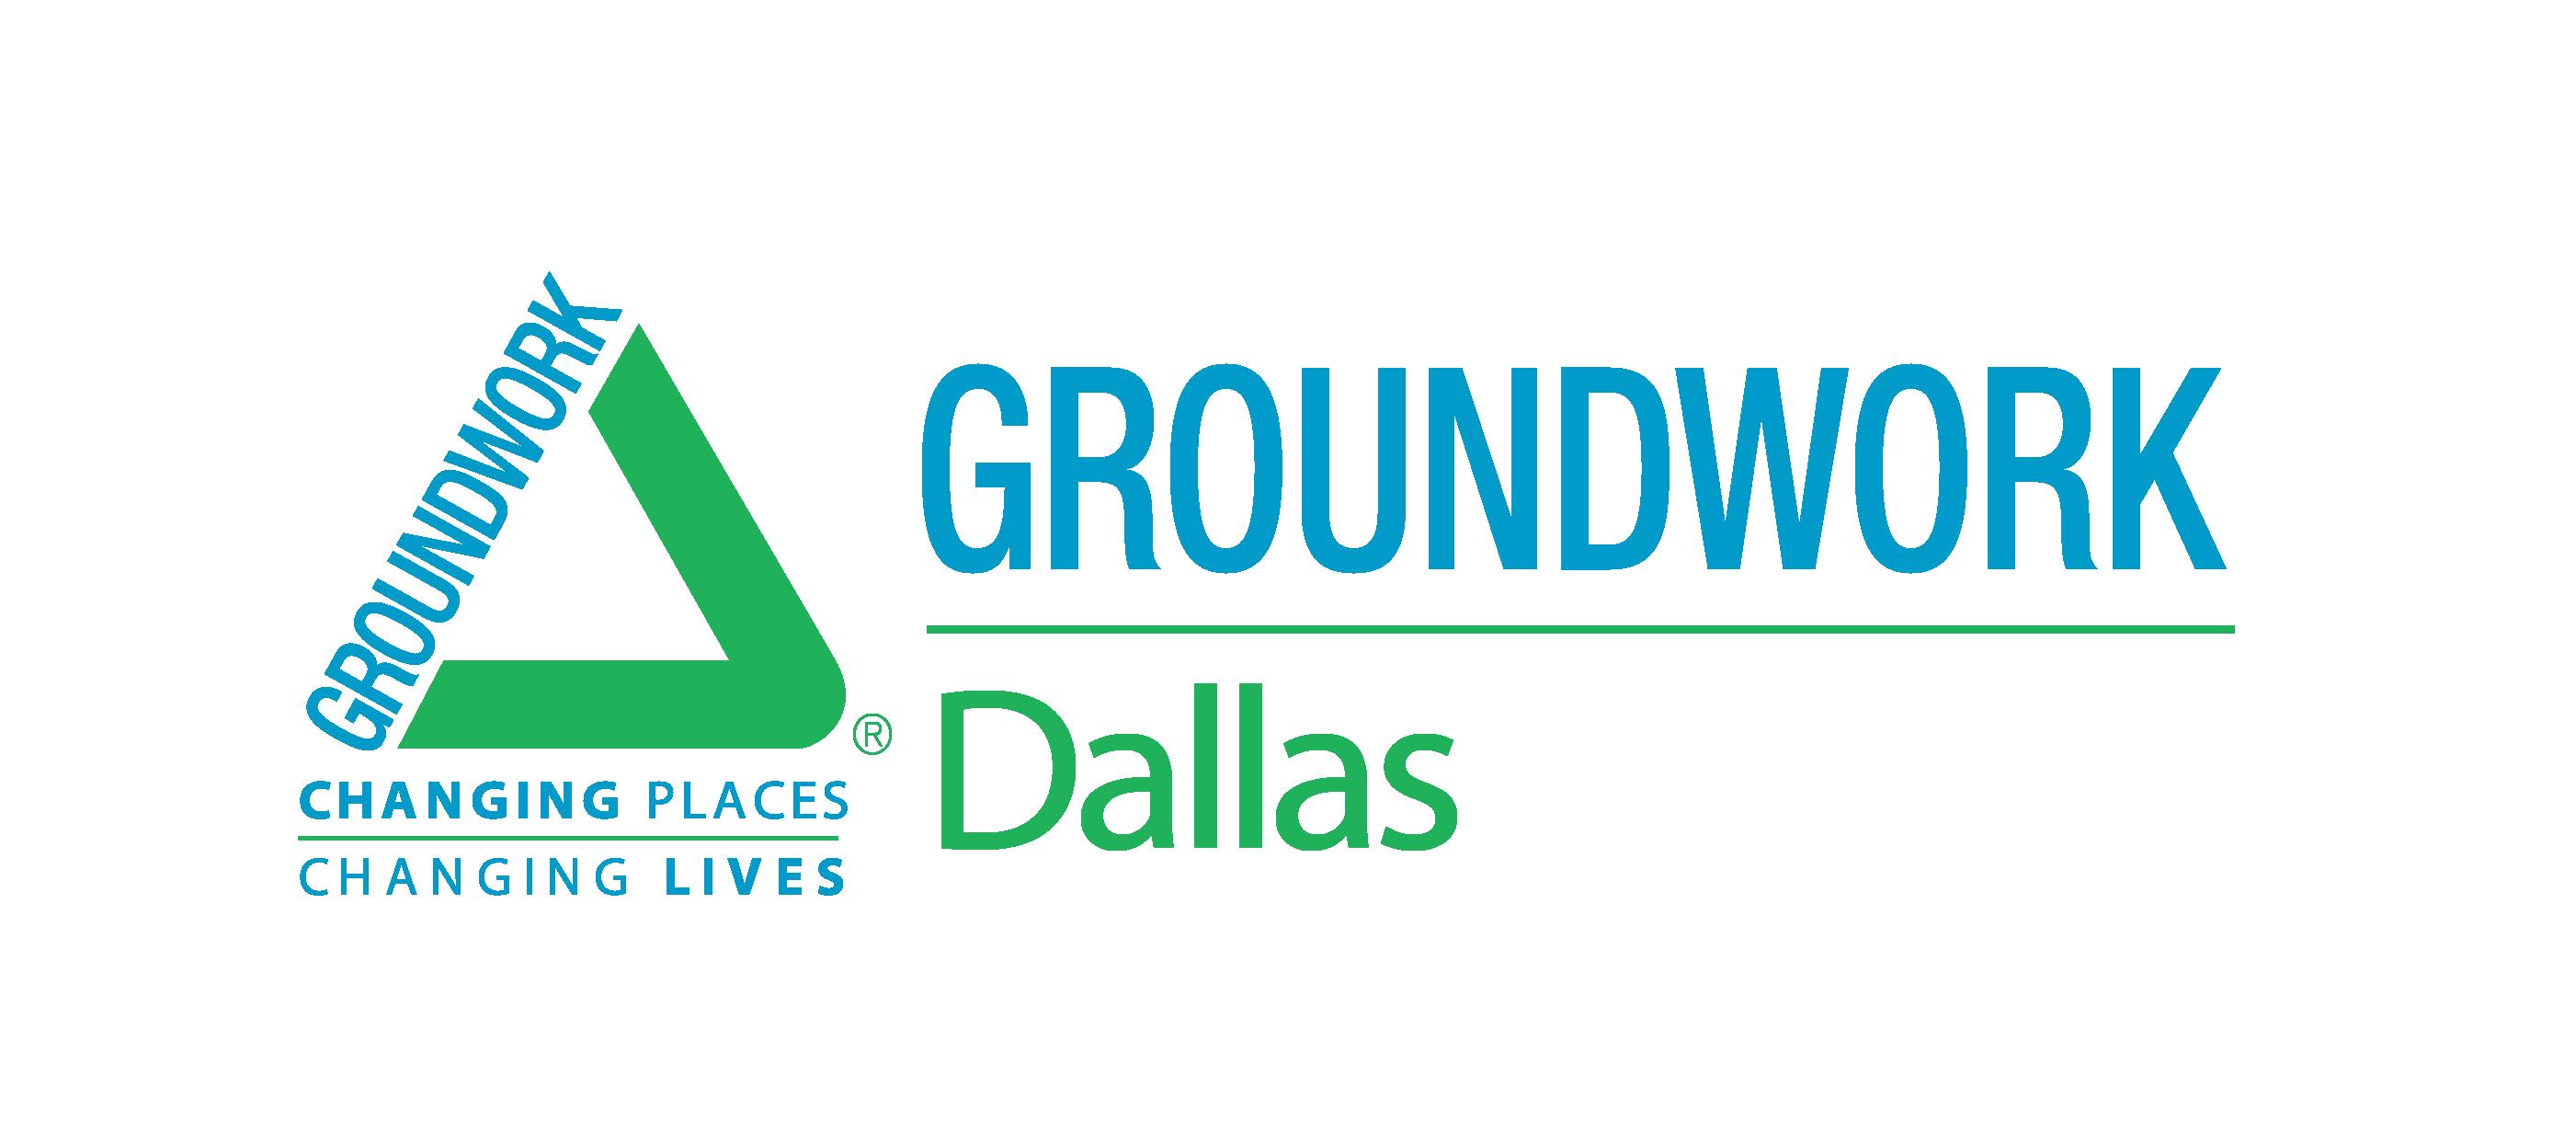 Groundwork Dallas